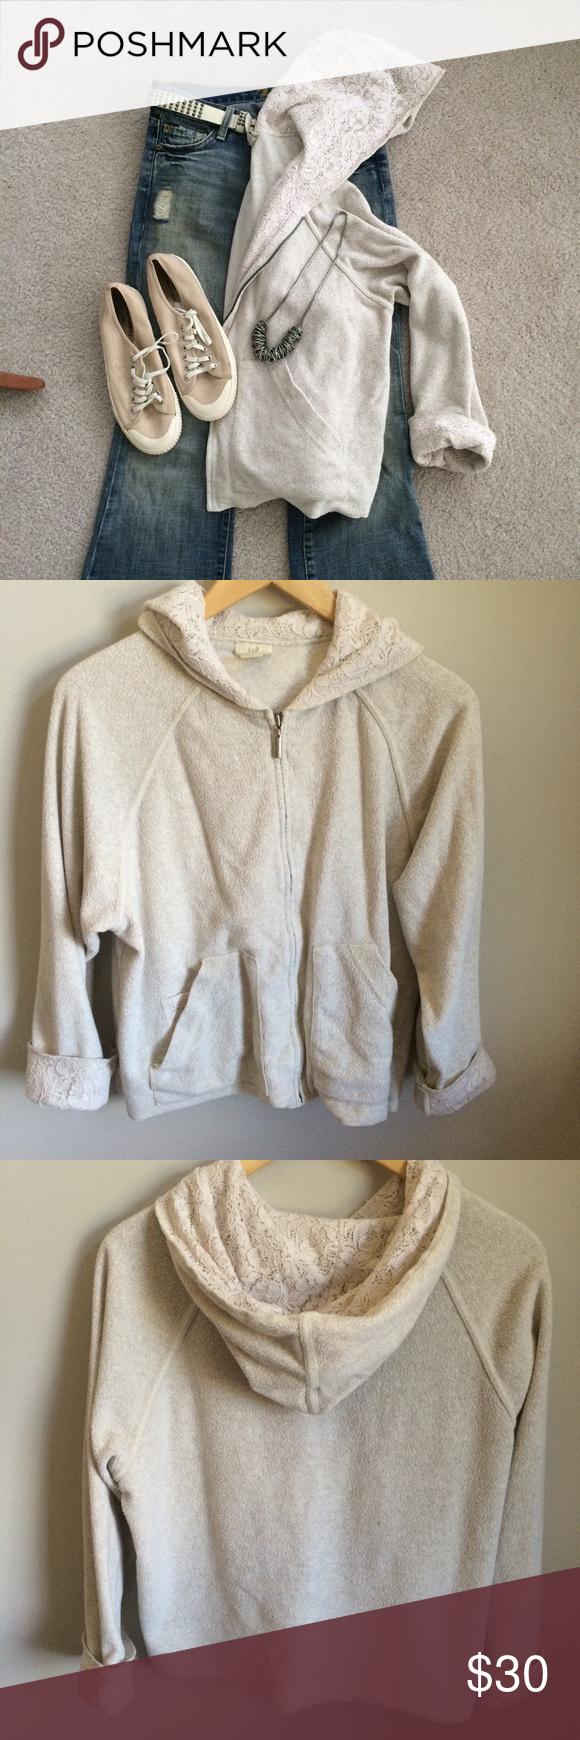 JJill Sweatshirt with Lace Oatmeal colored zip front hooded sweatshirt. Lace inside hood, along zipper and at cuffs. Very good condition. J. Jill Tops Sweatshirts & Hoodies